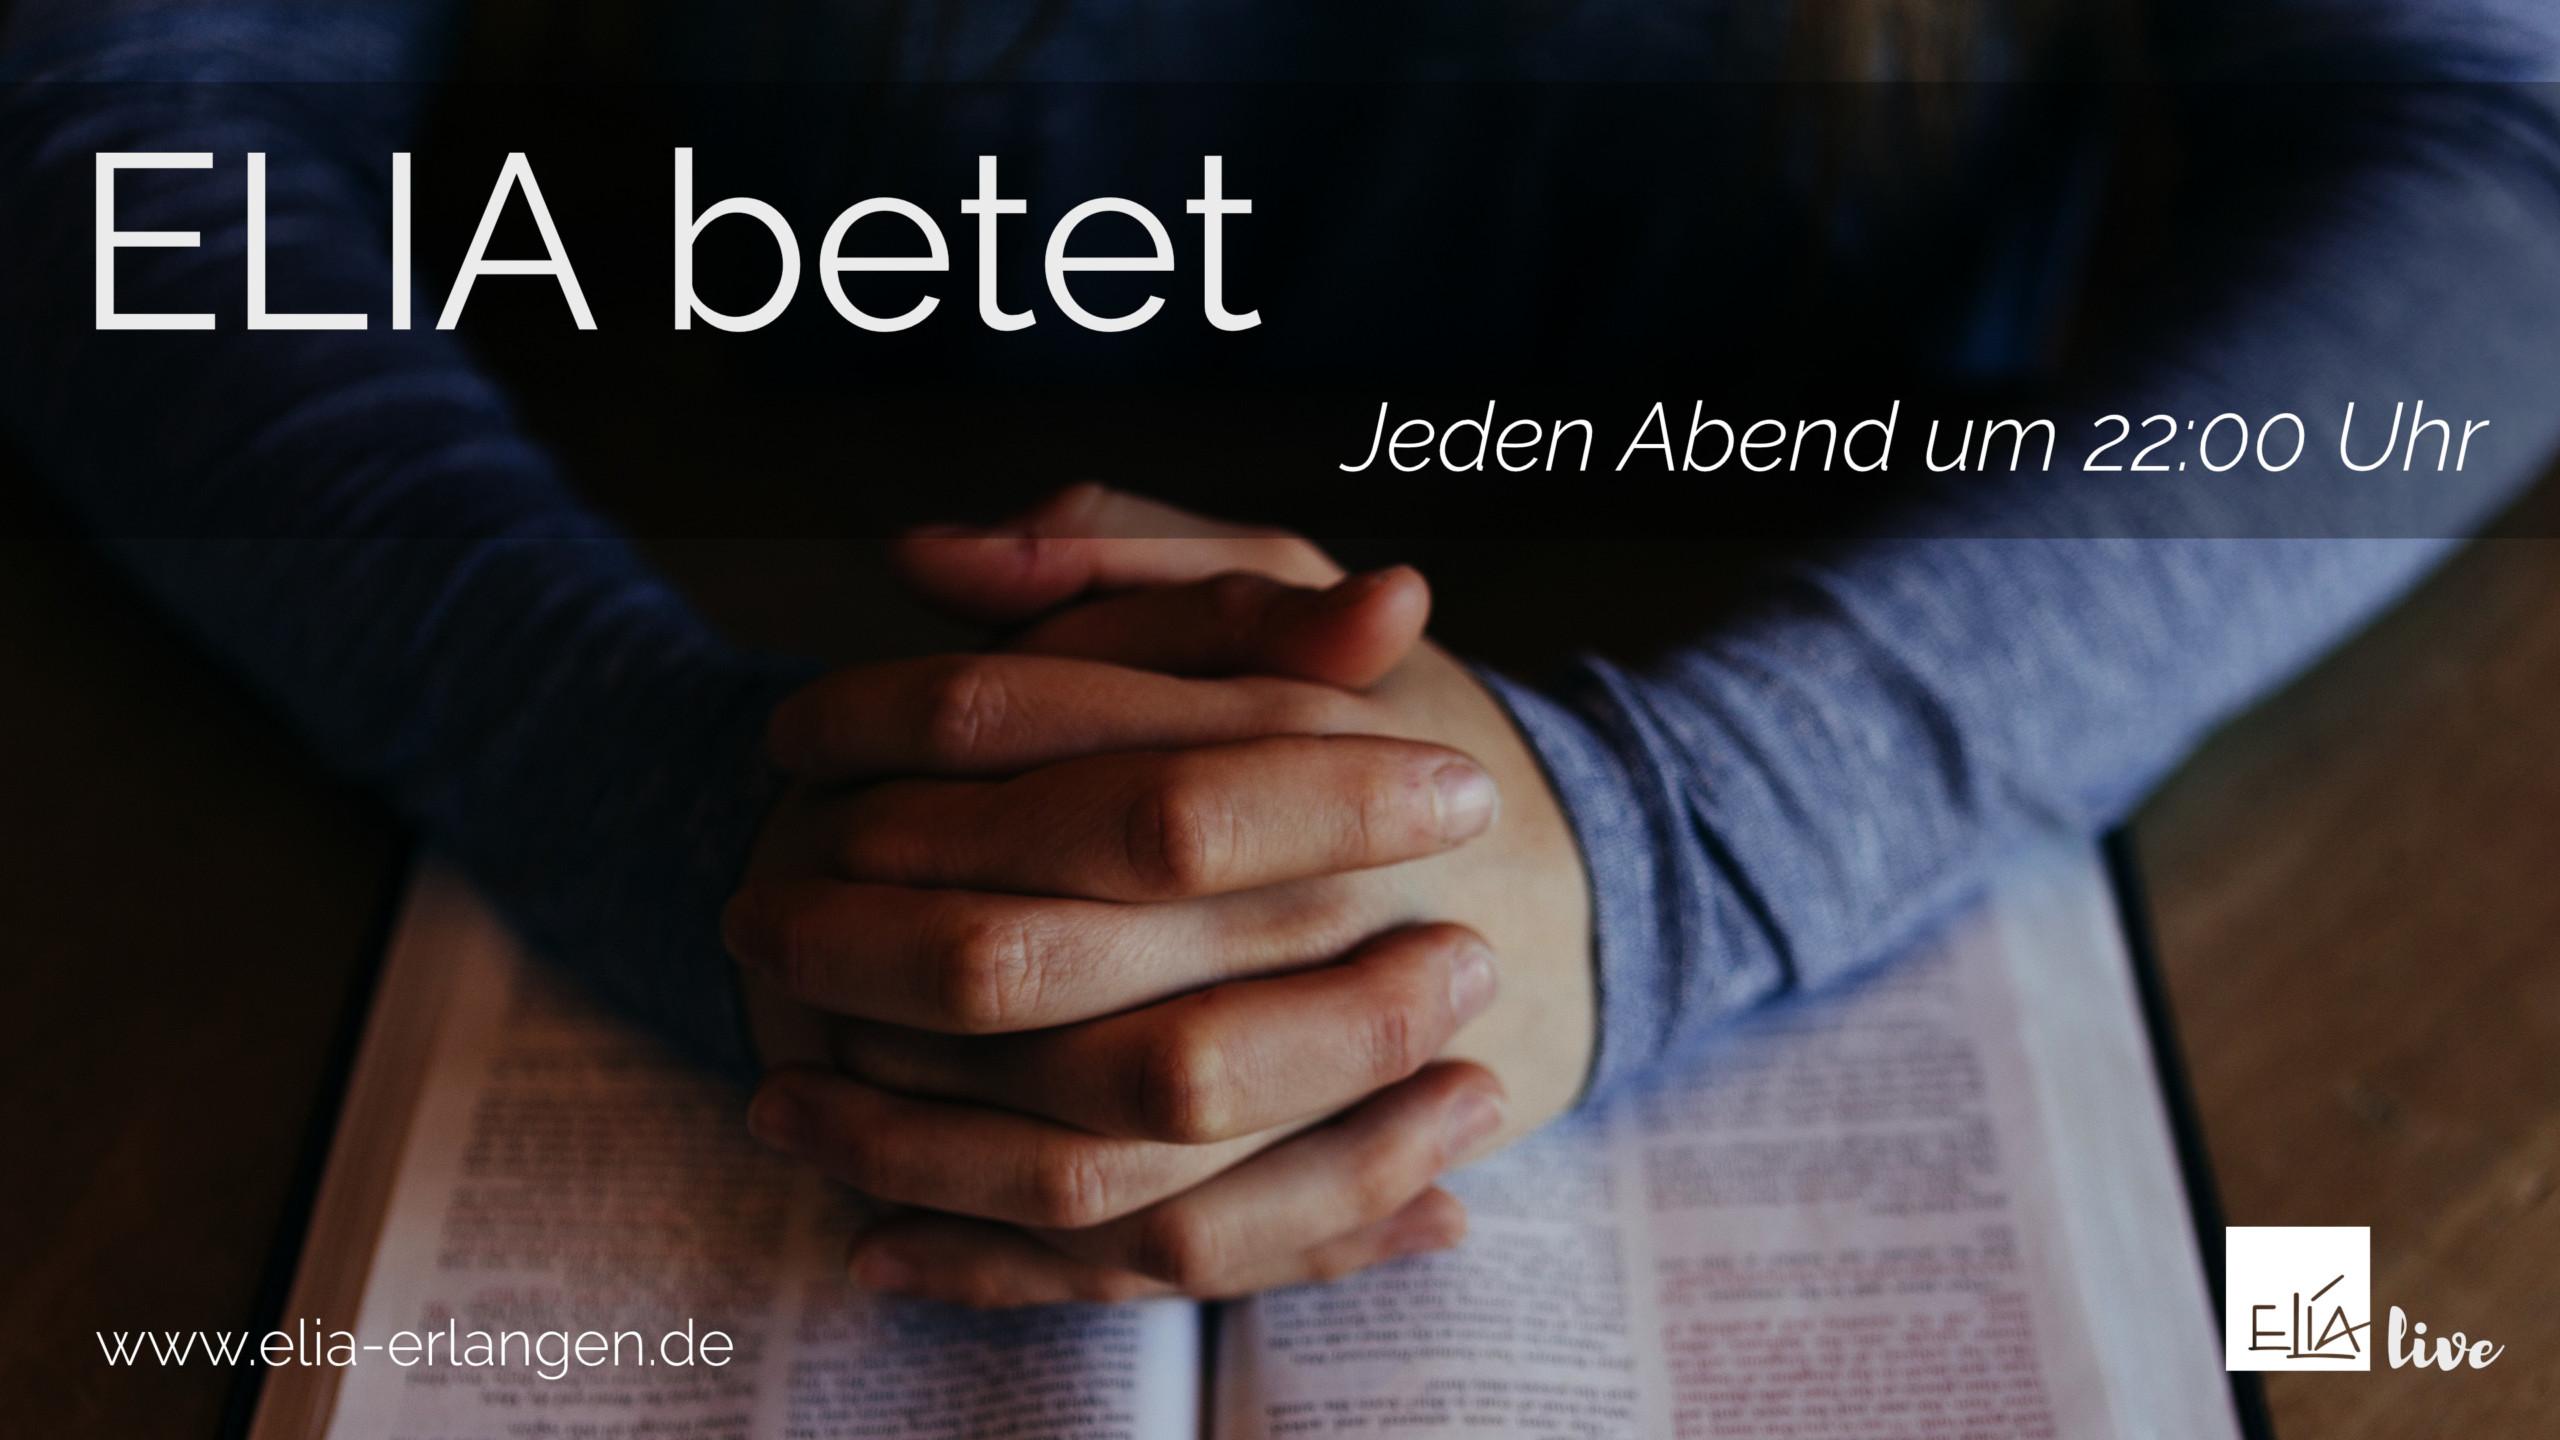 ELIA betet